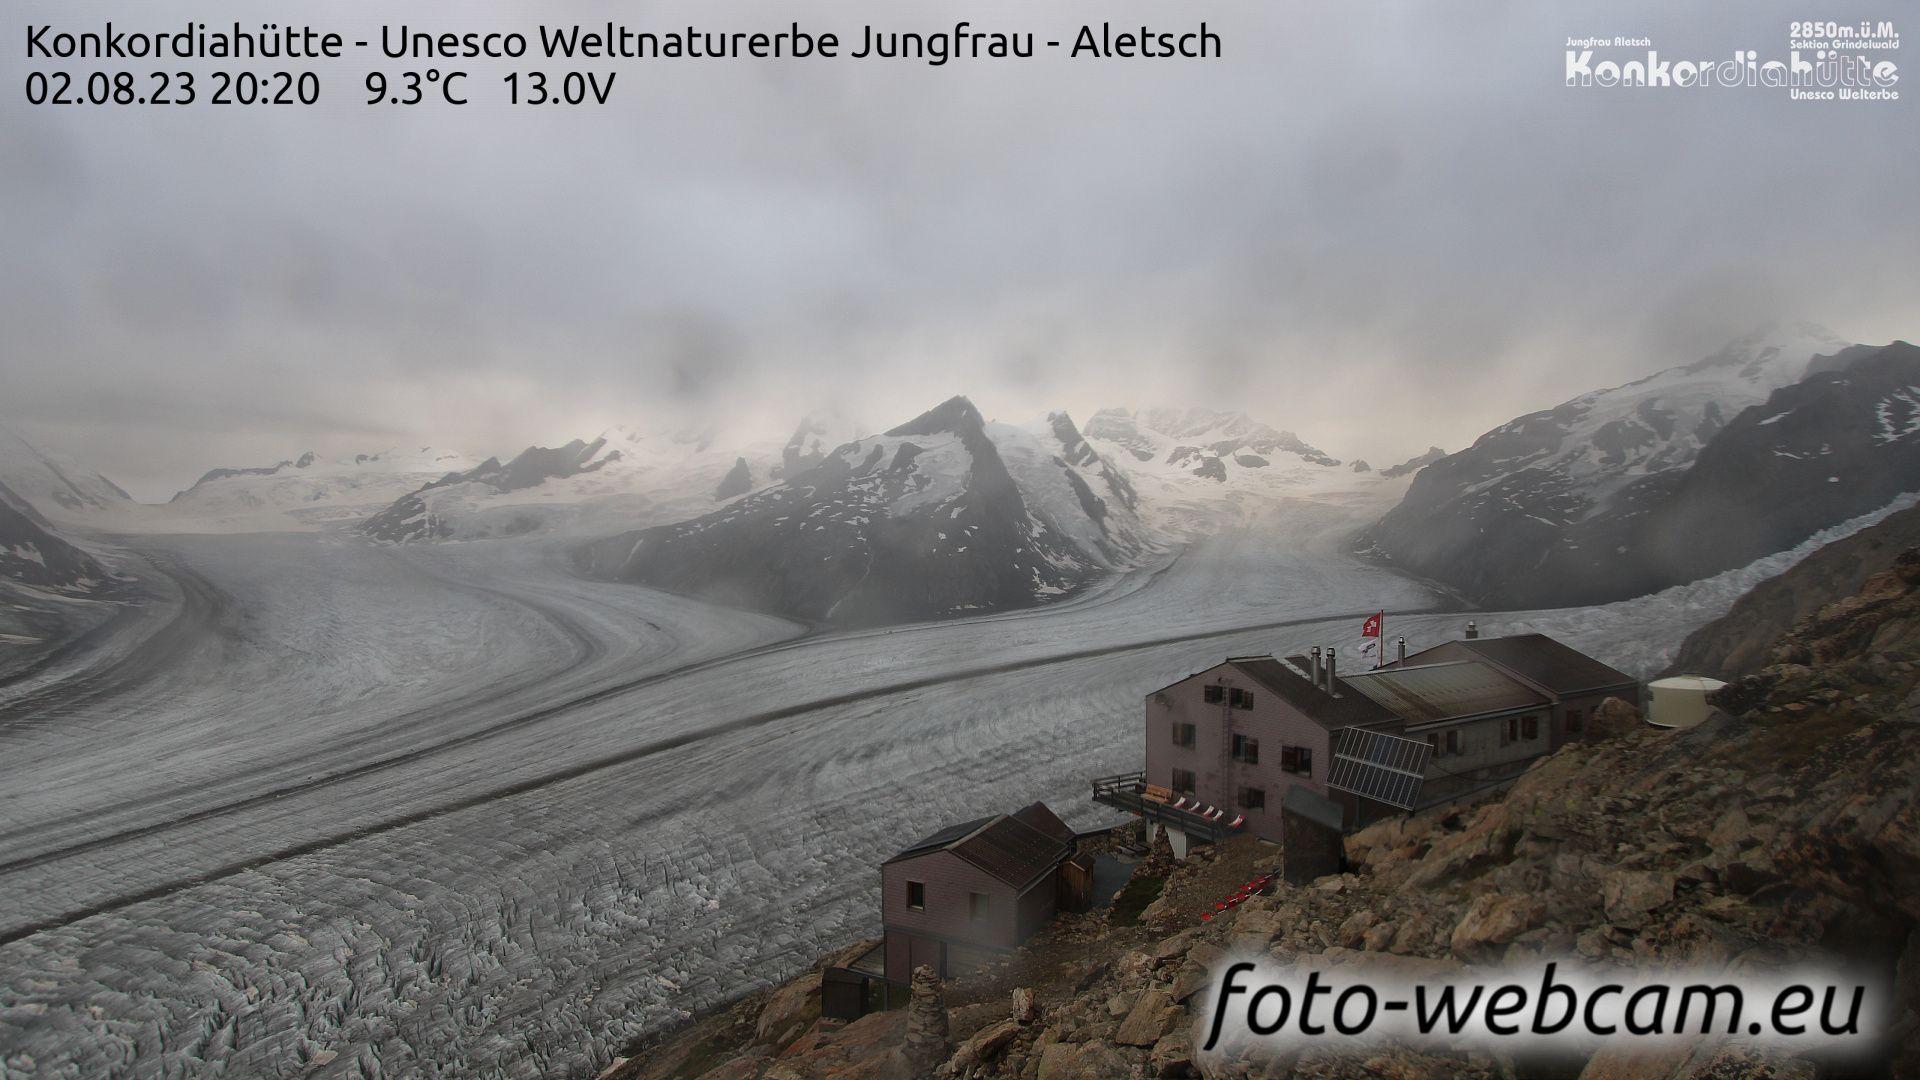 Fieschertal: Konkordiahütte - Trugberg - Gletscherhorn - Jungfraujoch - Hollandiahütte SAC - Ebnefluh - Jungfrau - Jungfrau Region